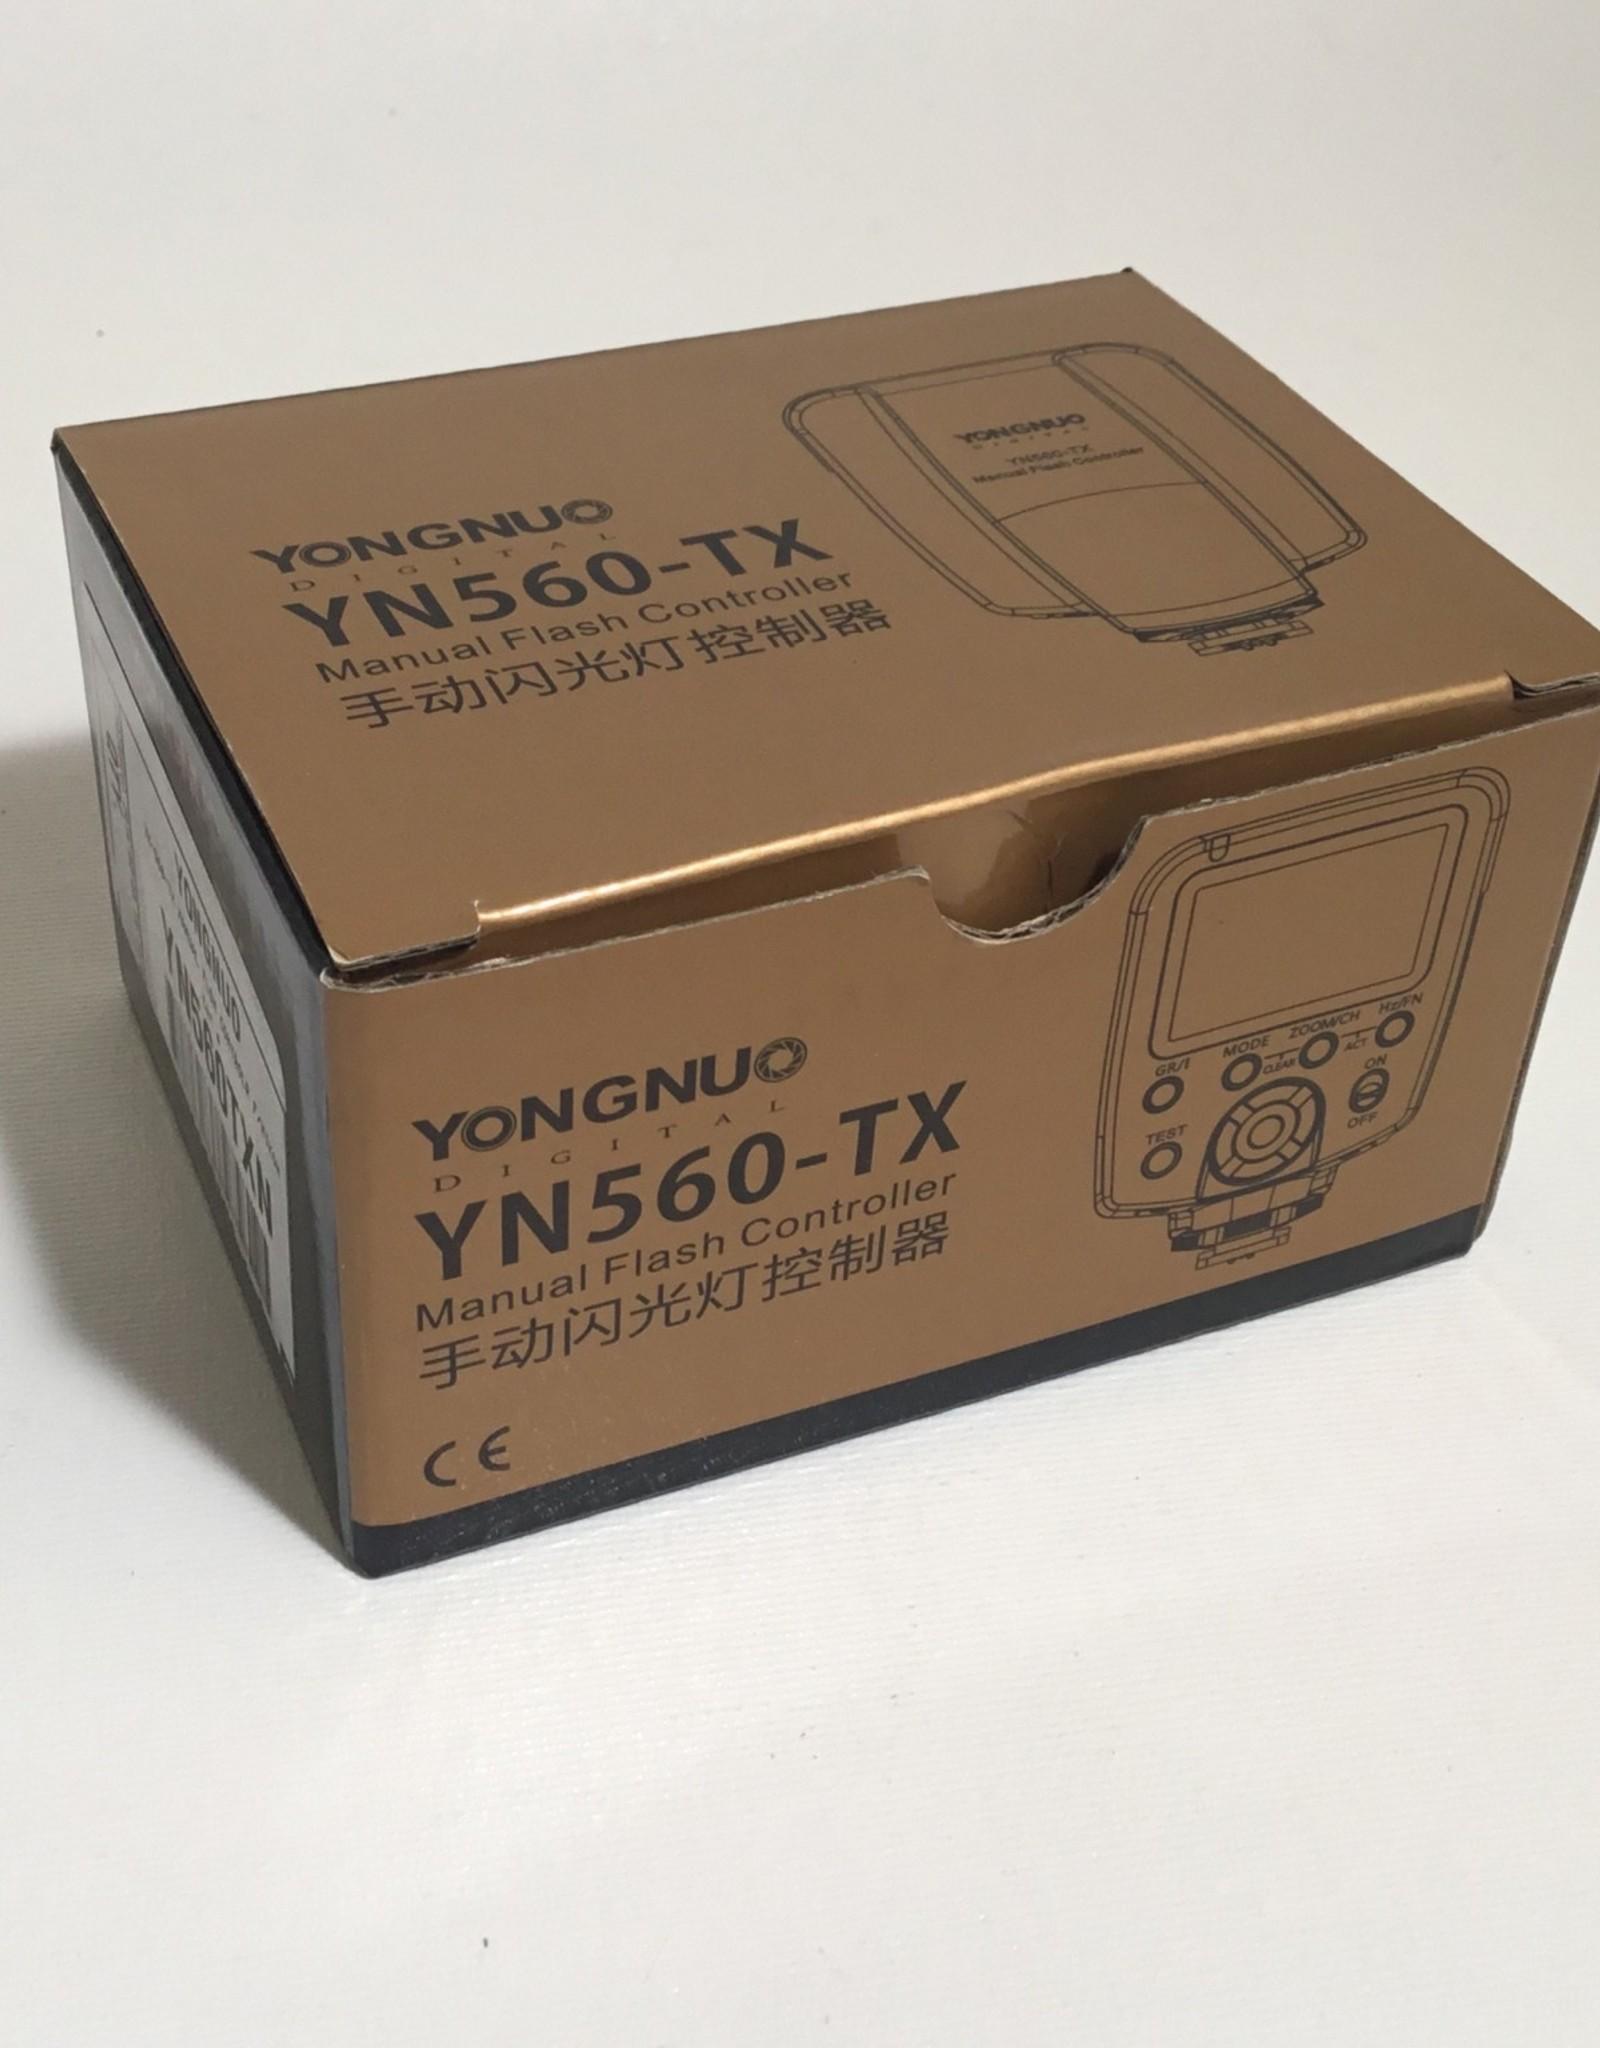 Youngnuo Yn569-TX flash controller for Nikon used in box